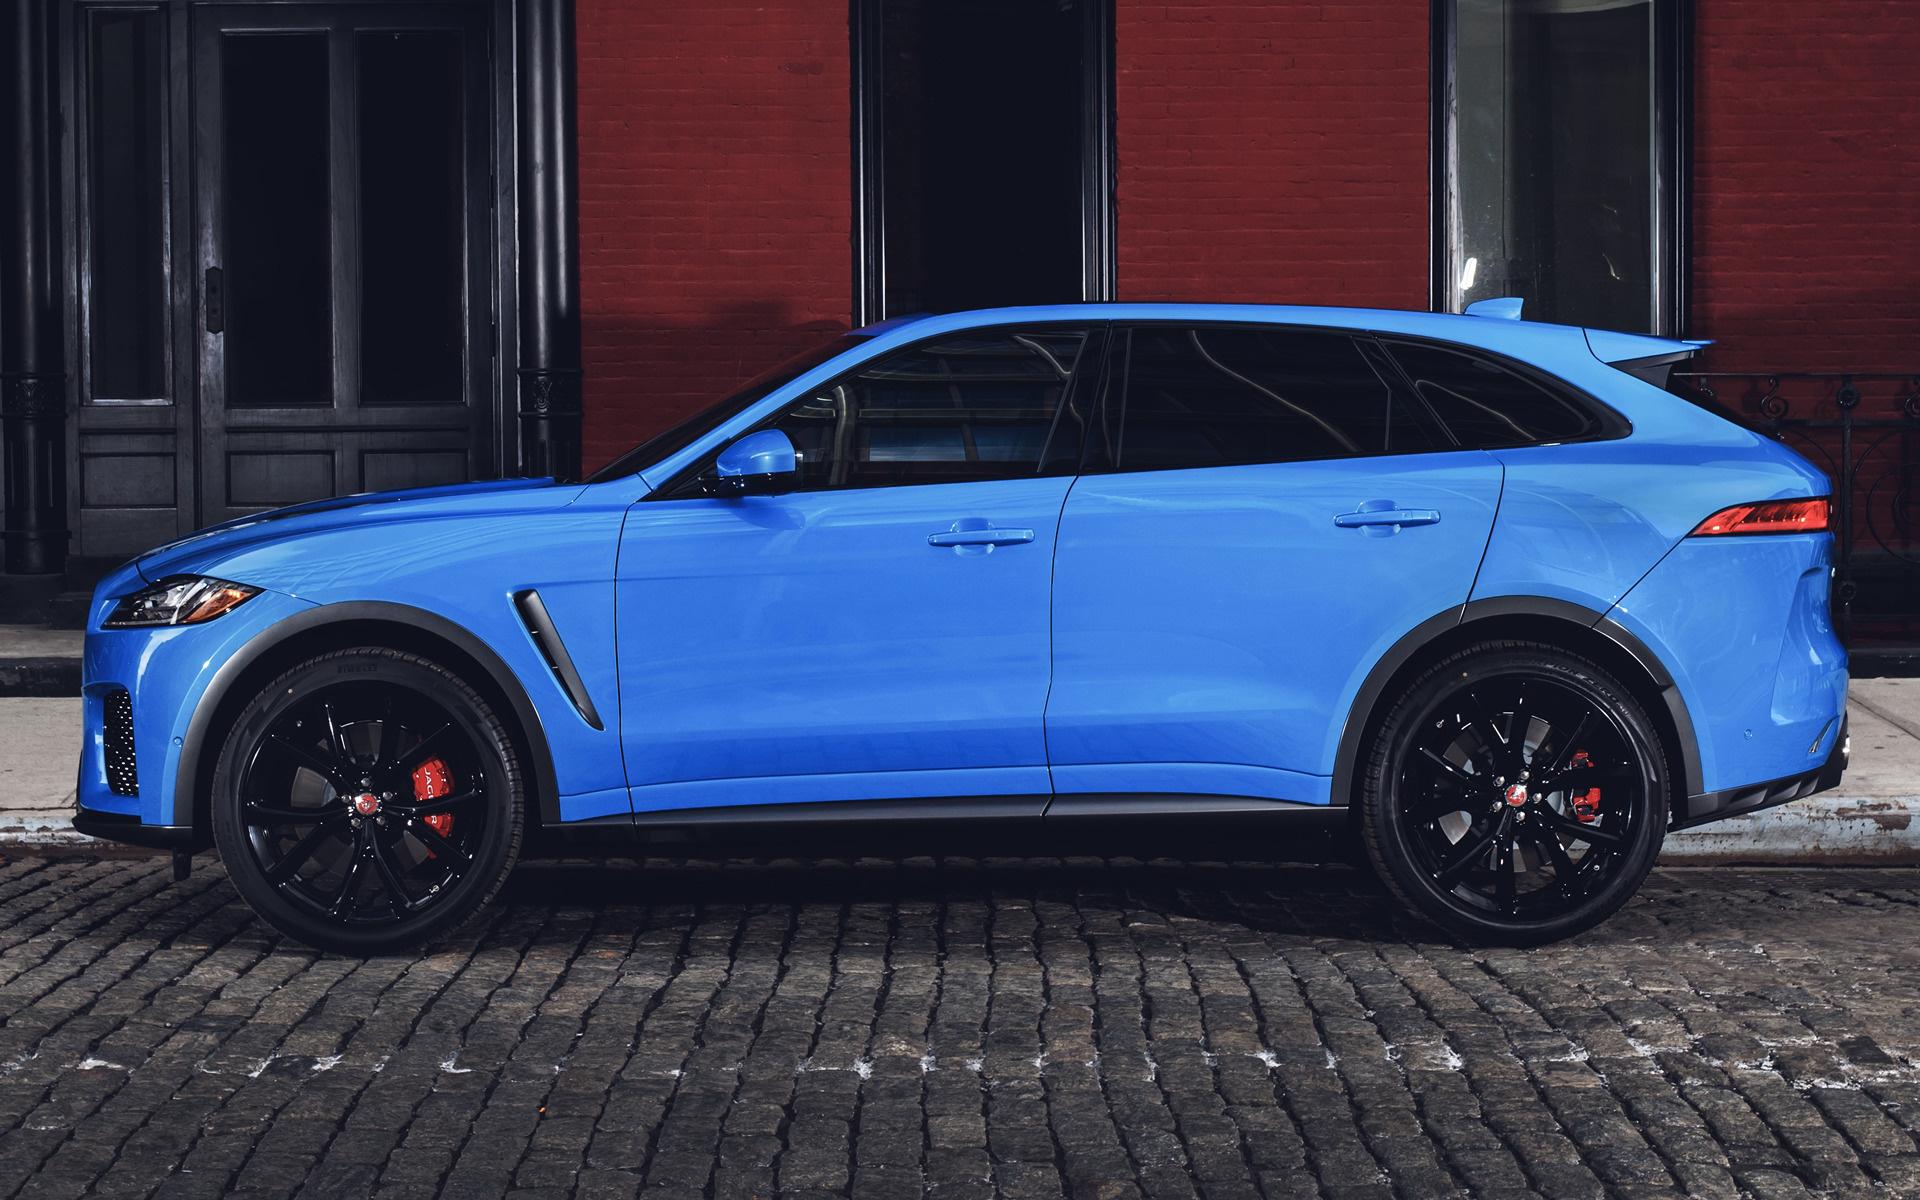 2019 Jaguar F-Pace SVR (US) - Wallpapers and HD Images ...